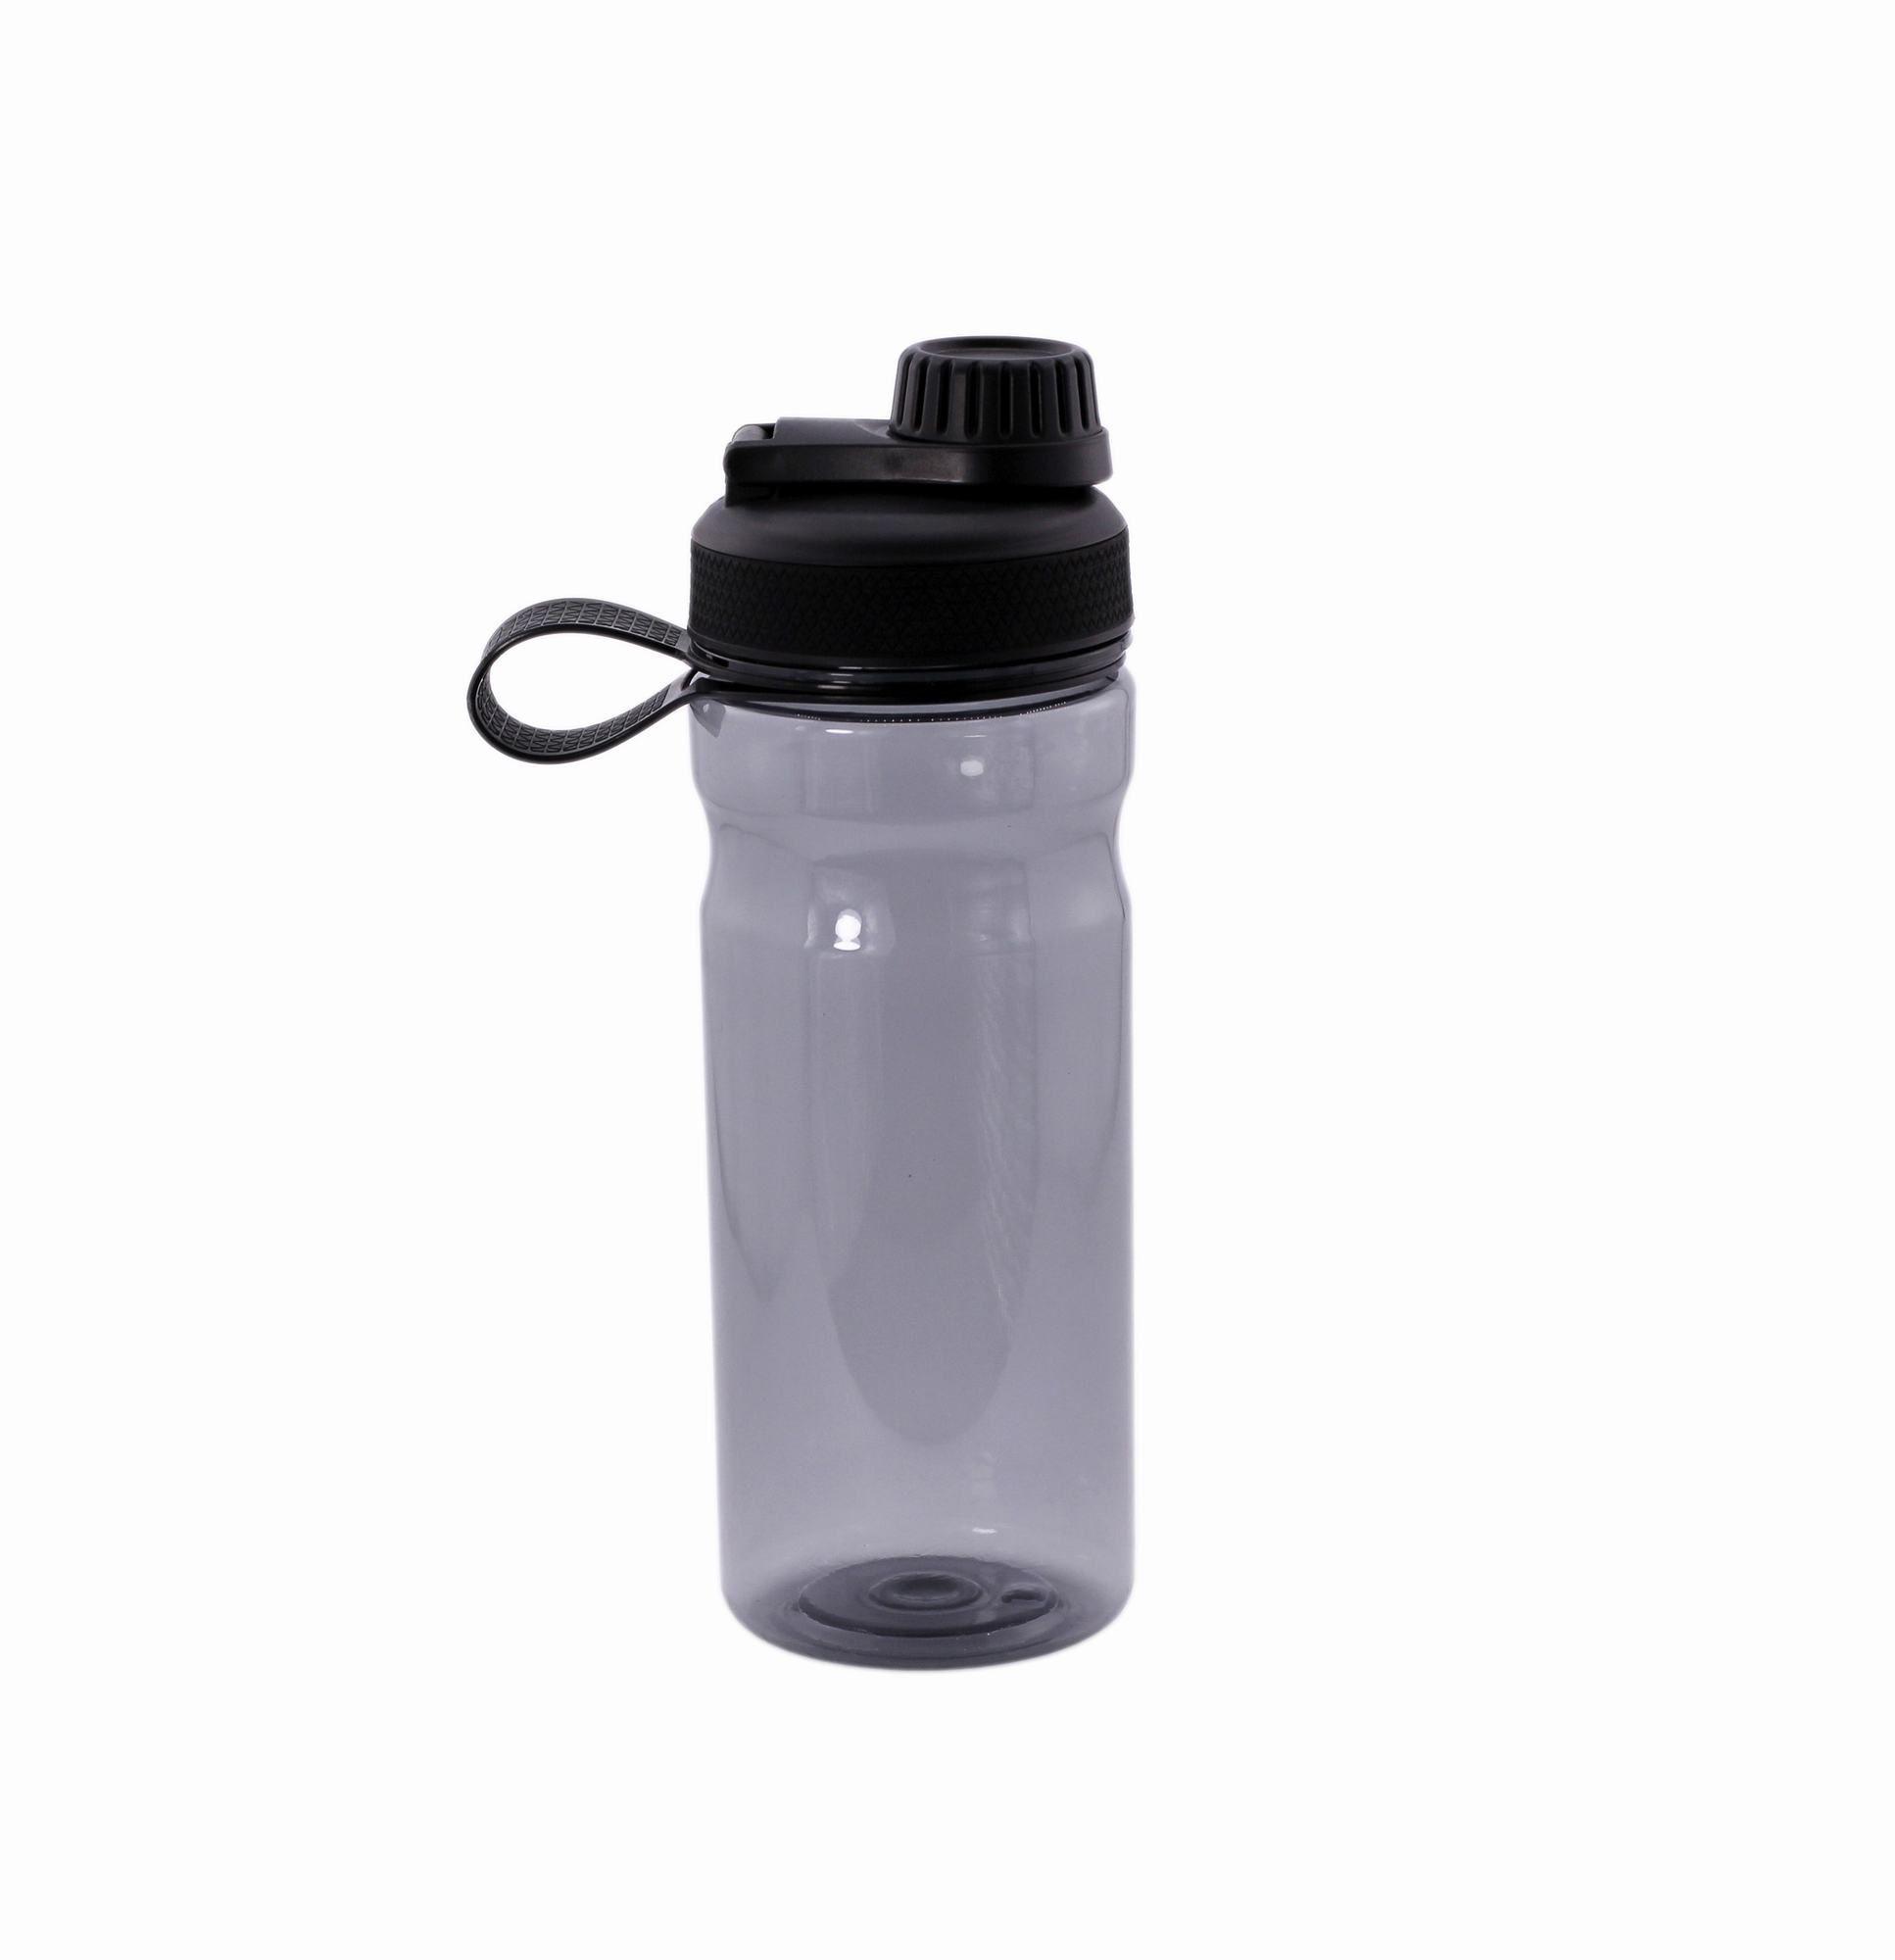 27oz BPA FREE Double Lids Wide Mouth Tritan Water Bottle